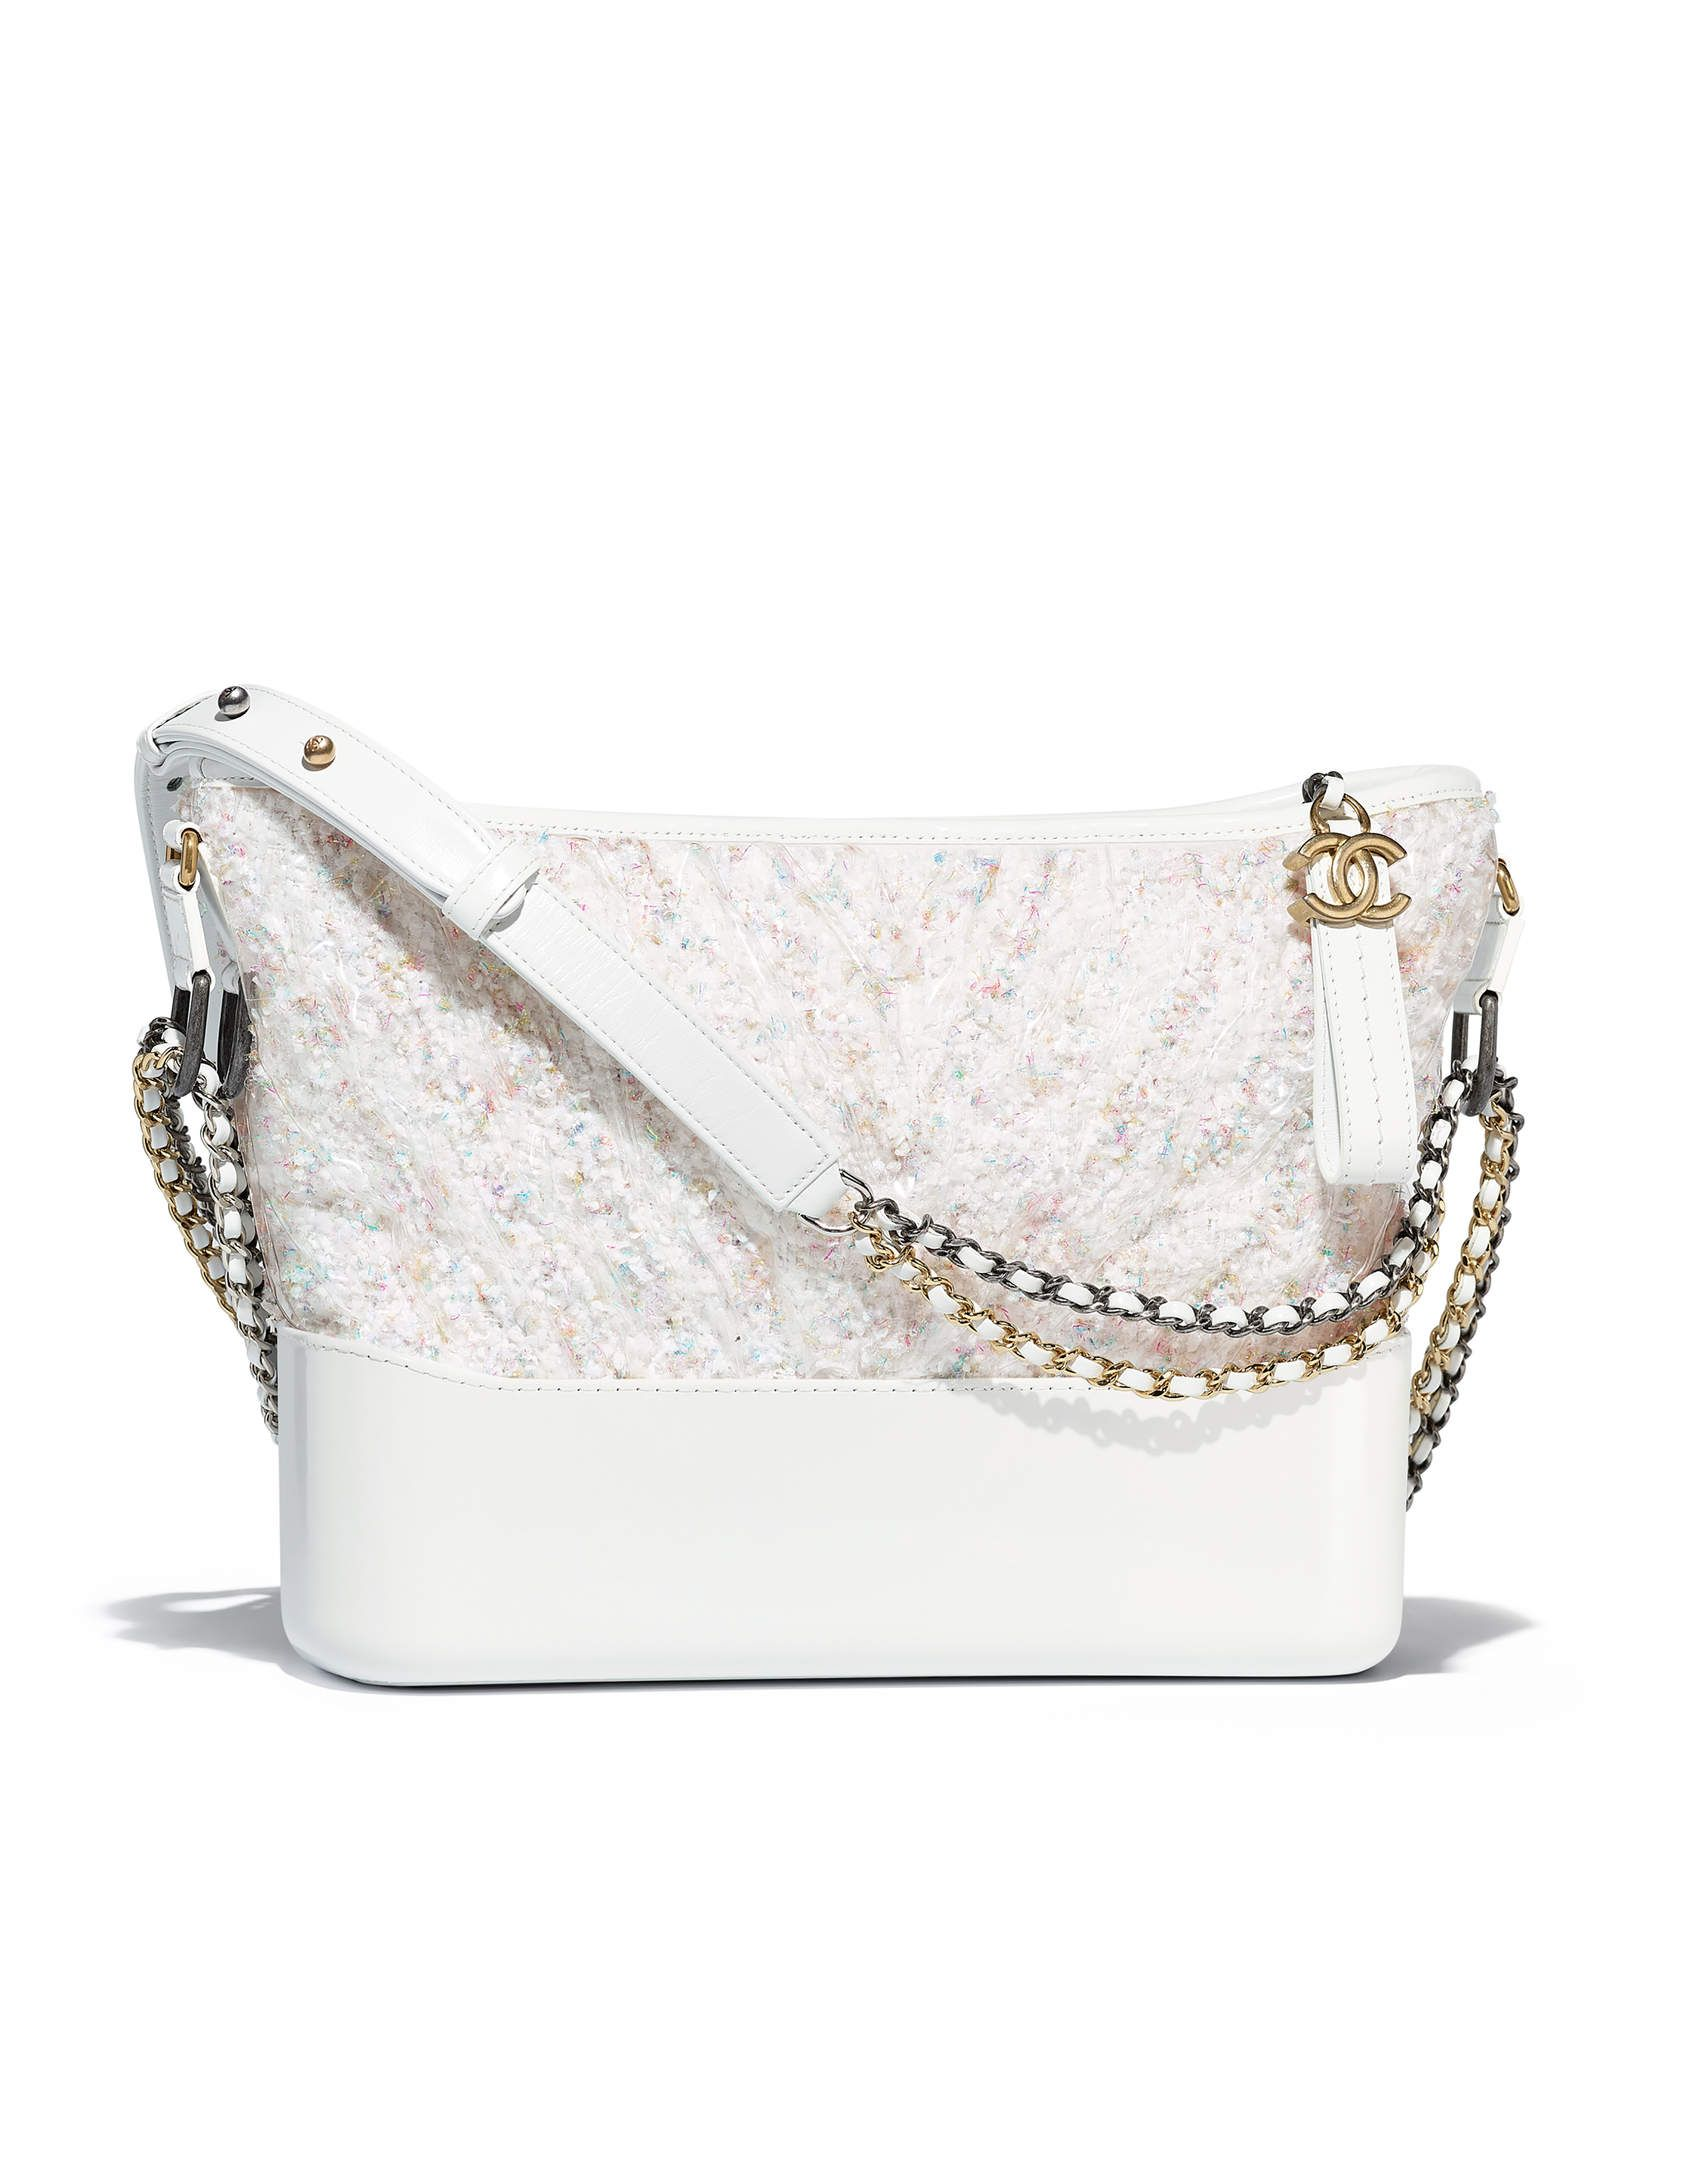 36f2ac25797e2f Hobo handbag CHANEL's GABRIELLE, tweed, pvc, patent calfskin, silver-tone &  gold-tone metal-white - CHANEL